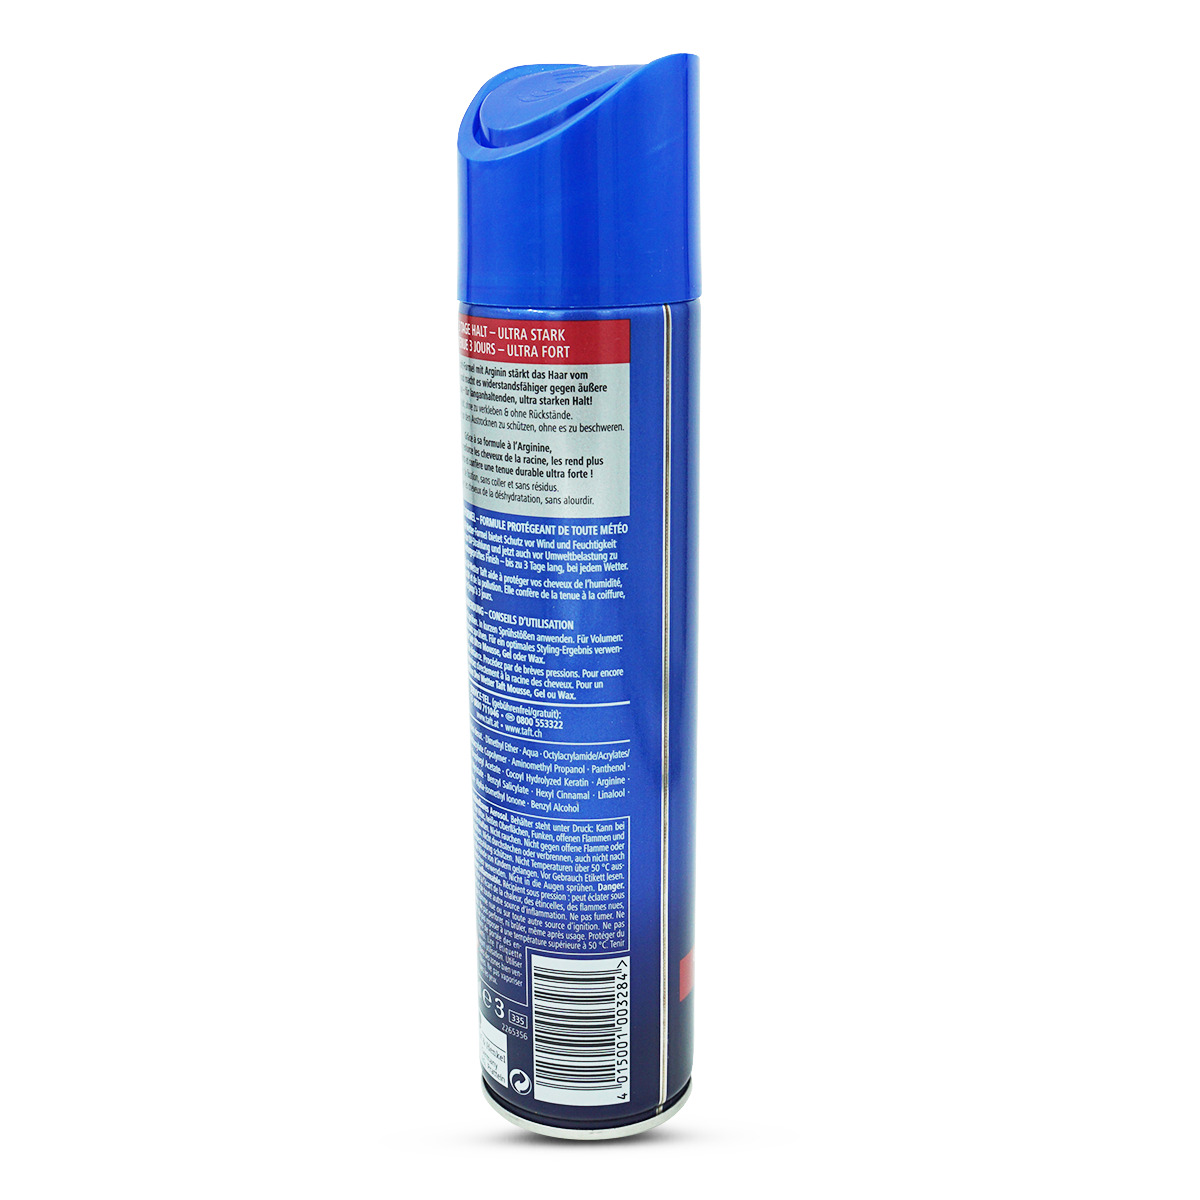 Taft Hairspray Ultra Aerosol